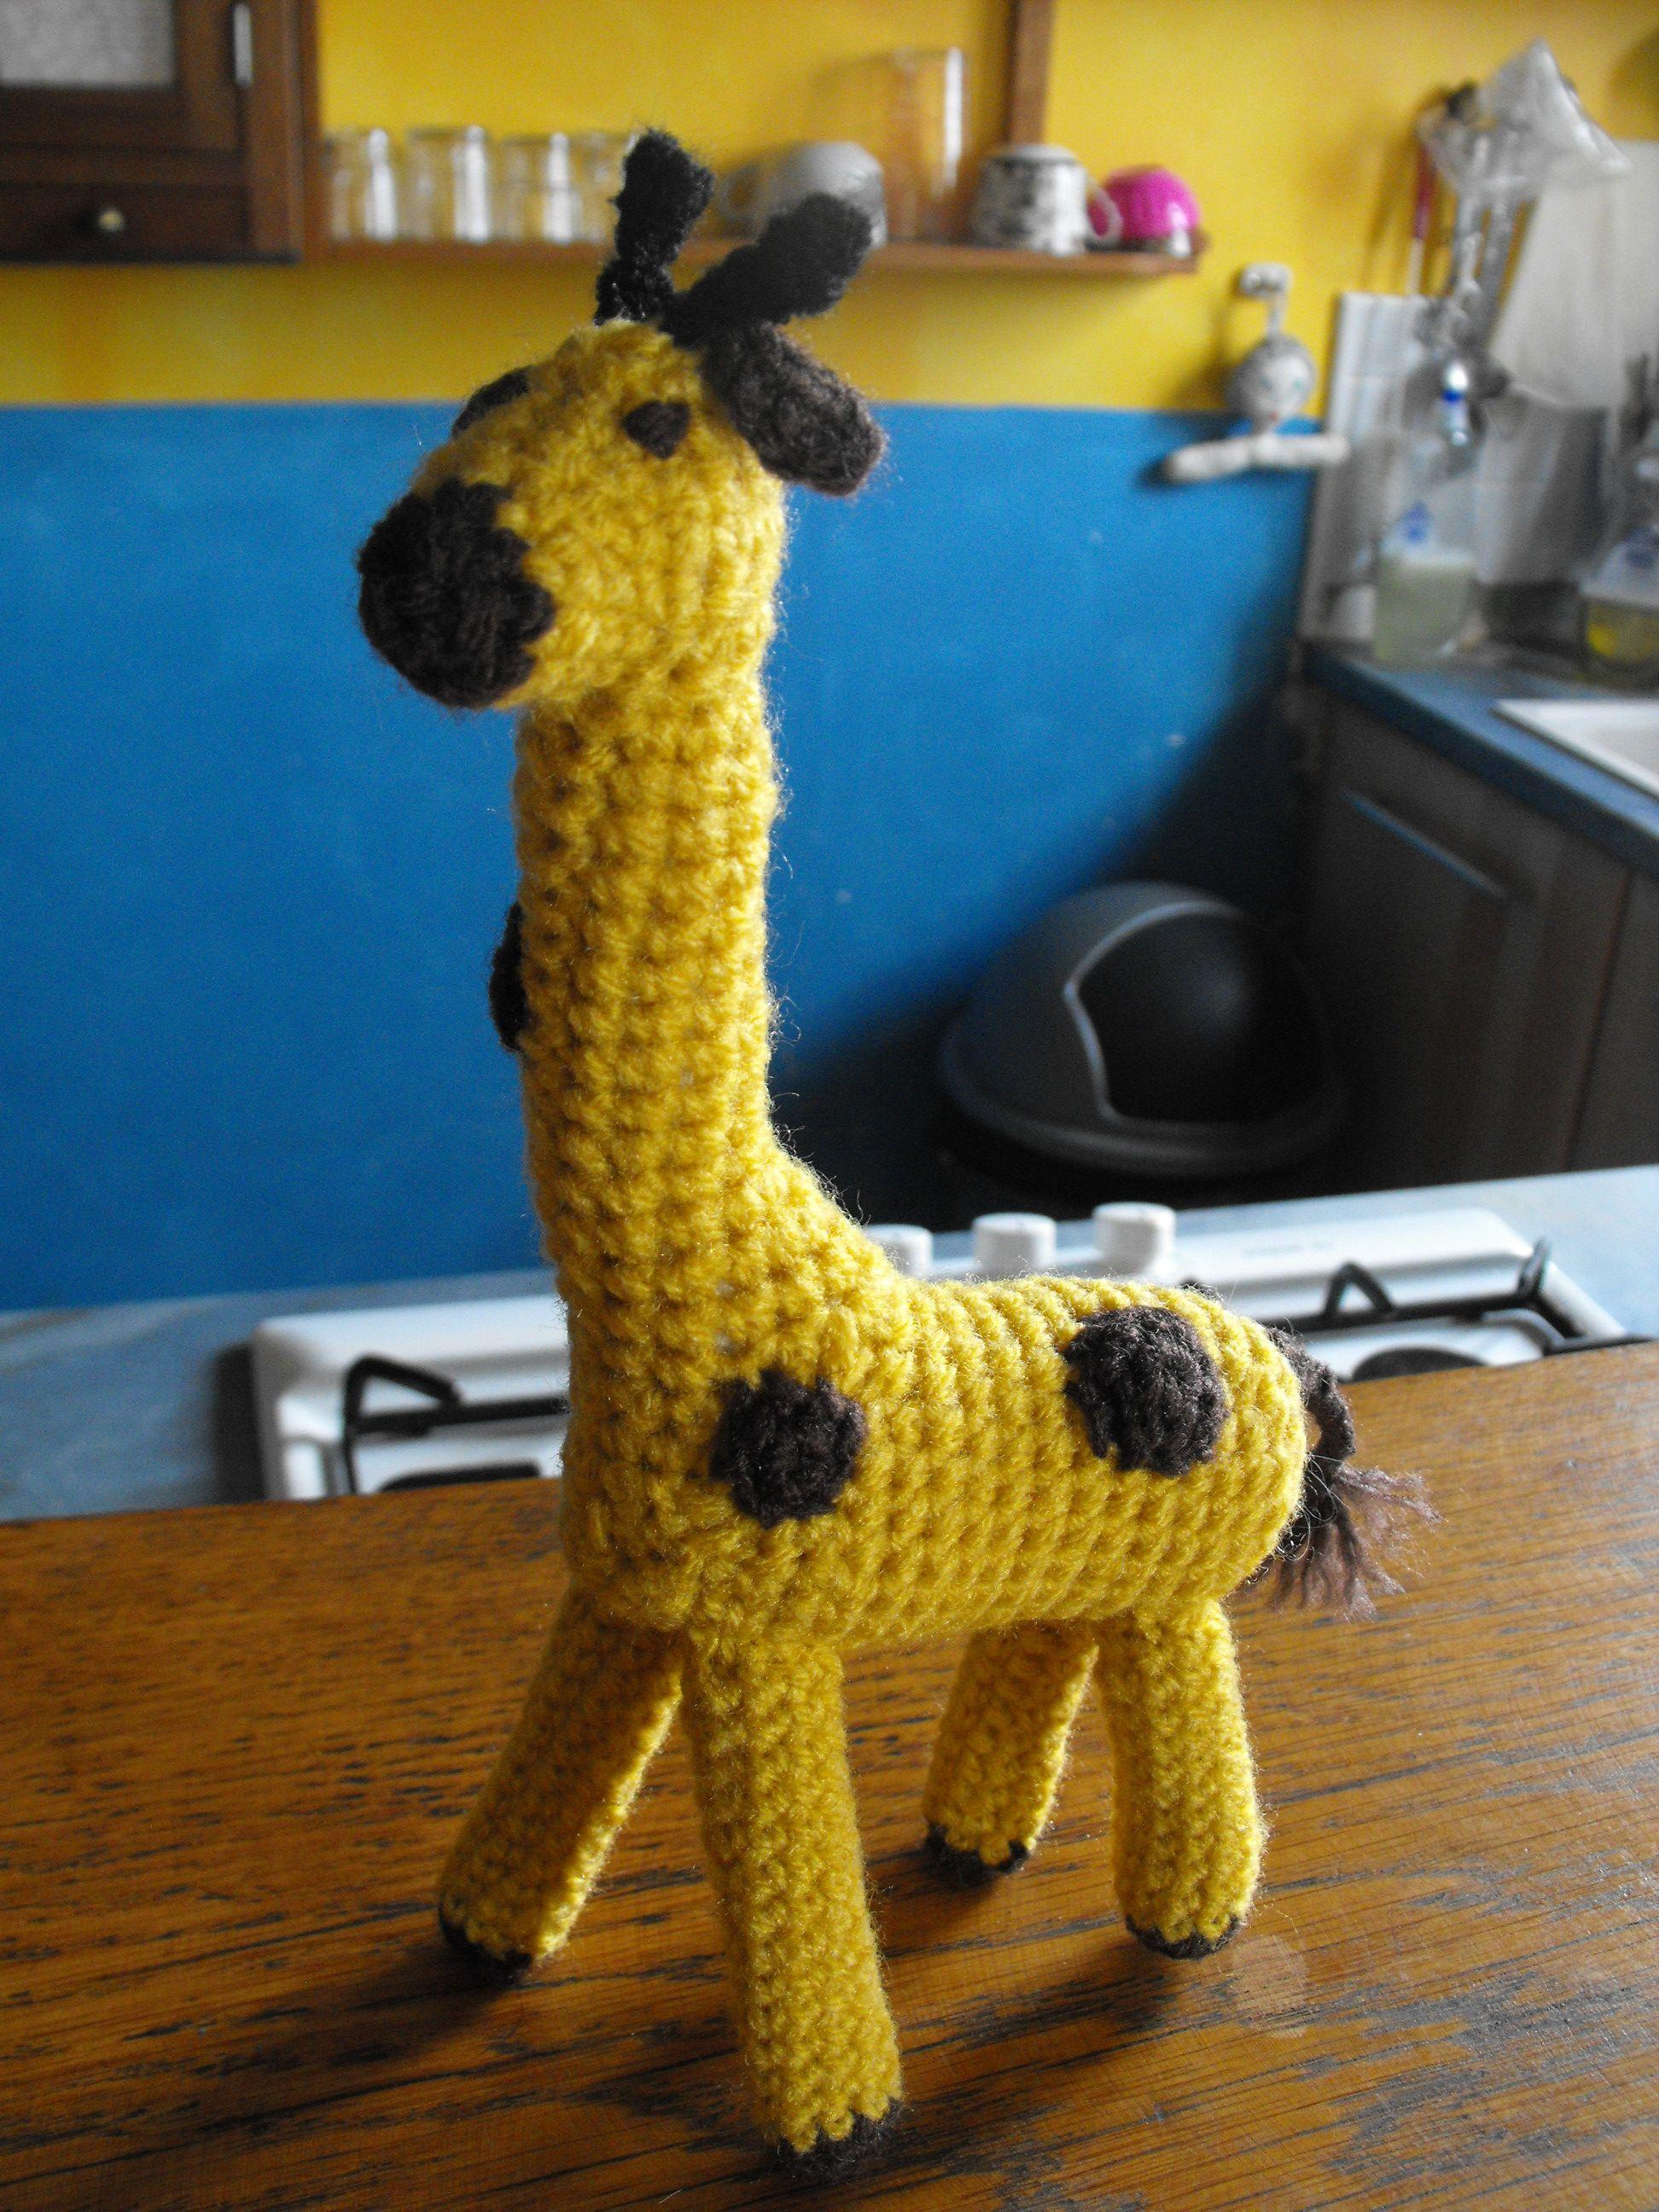 la girafe demandée par Sacha